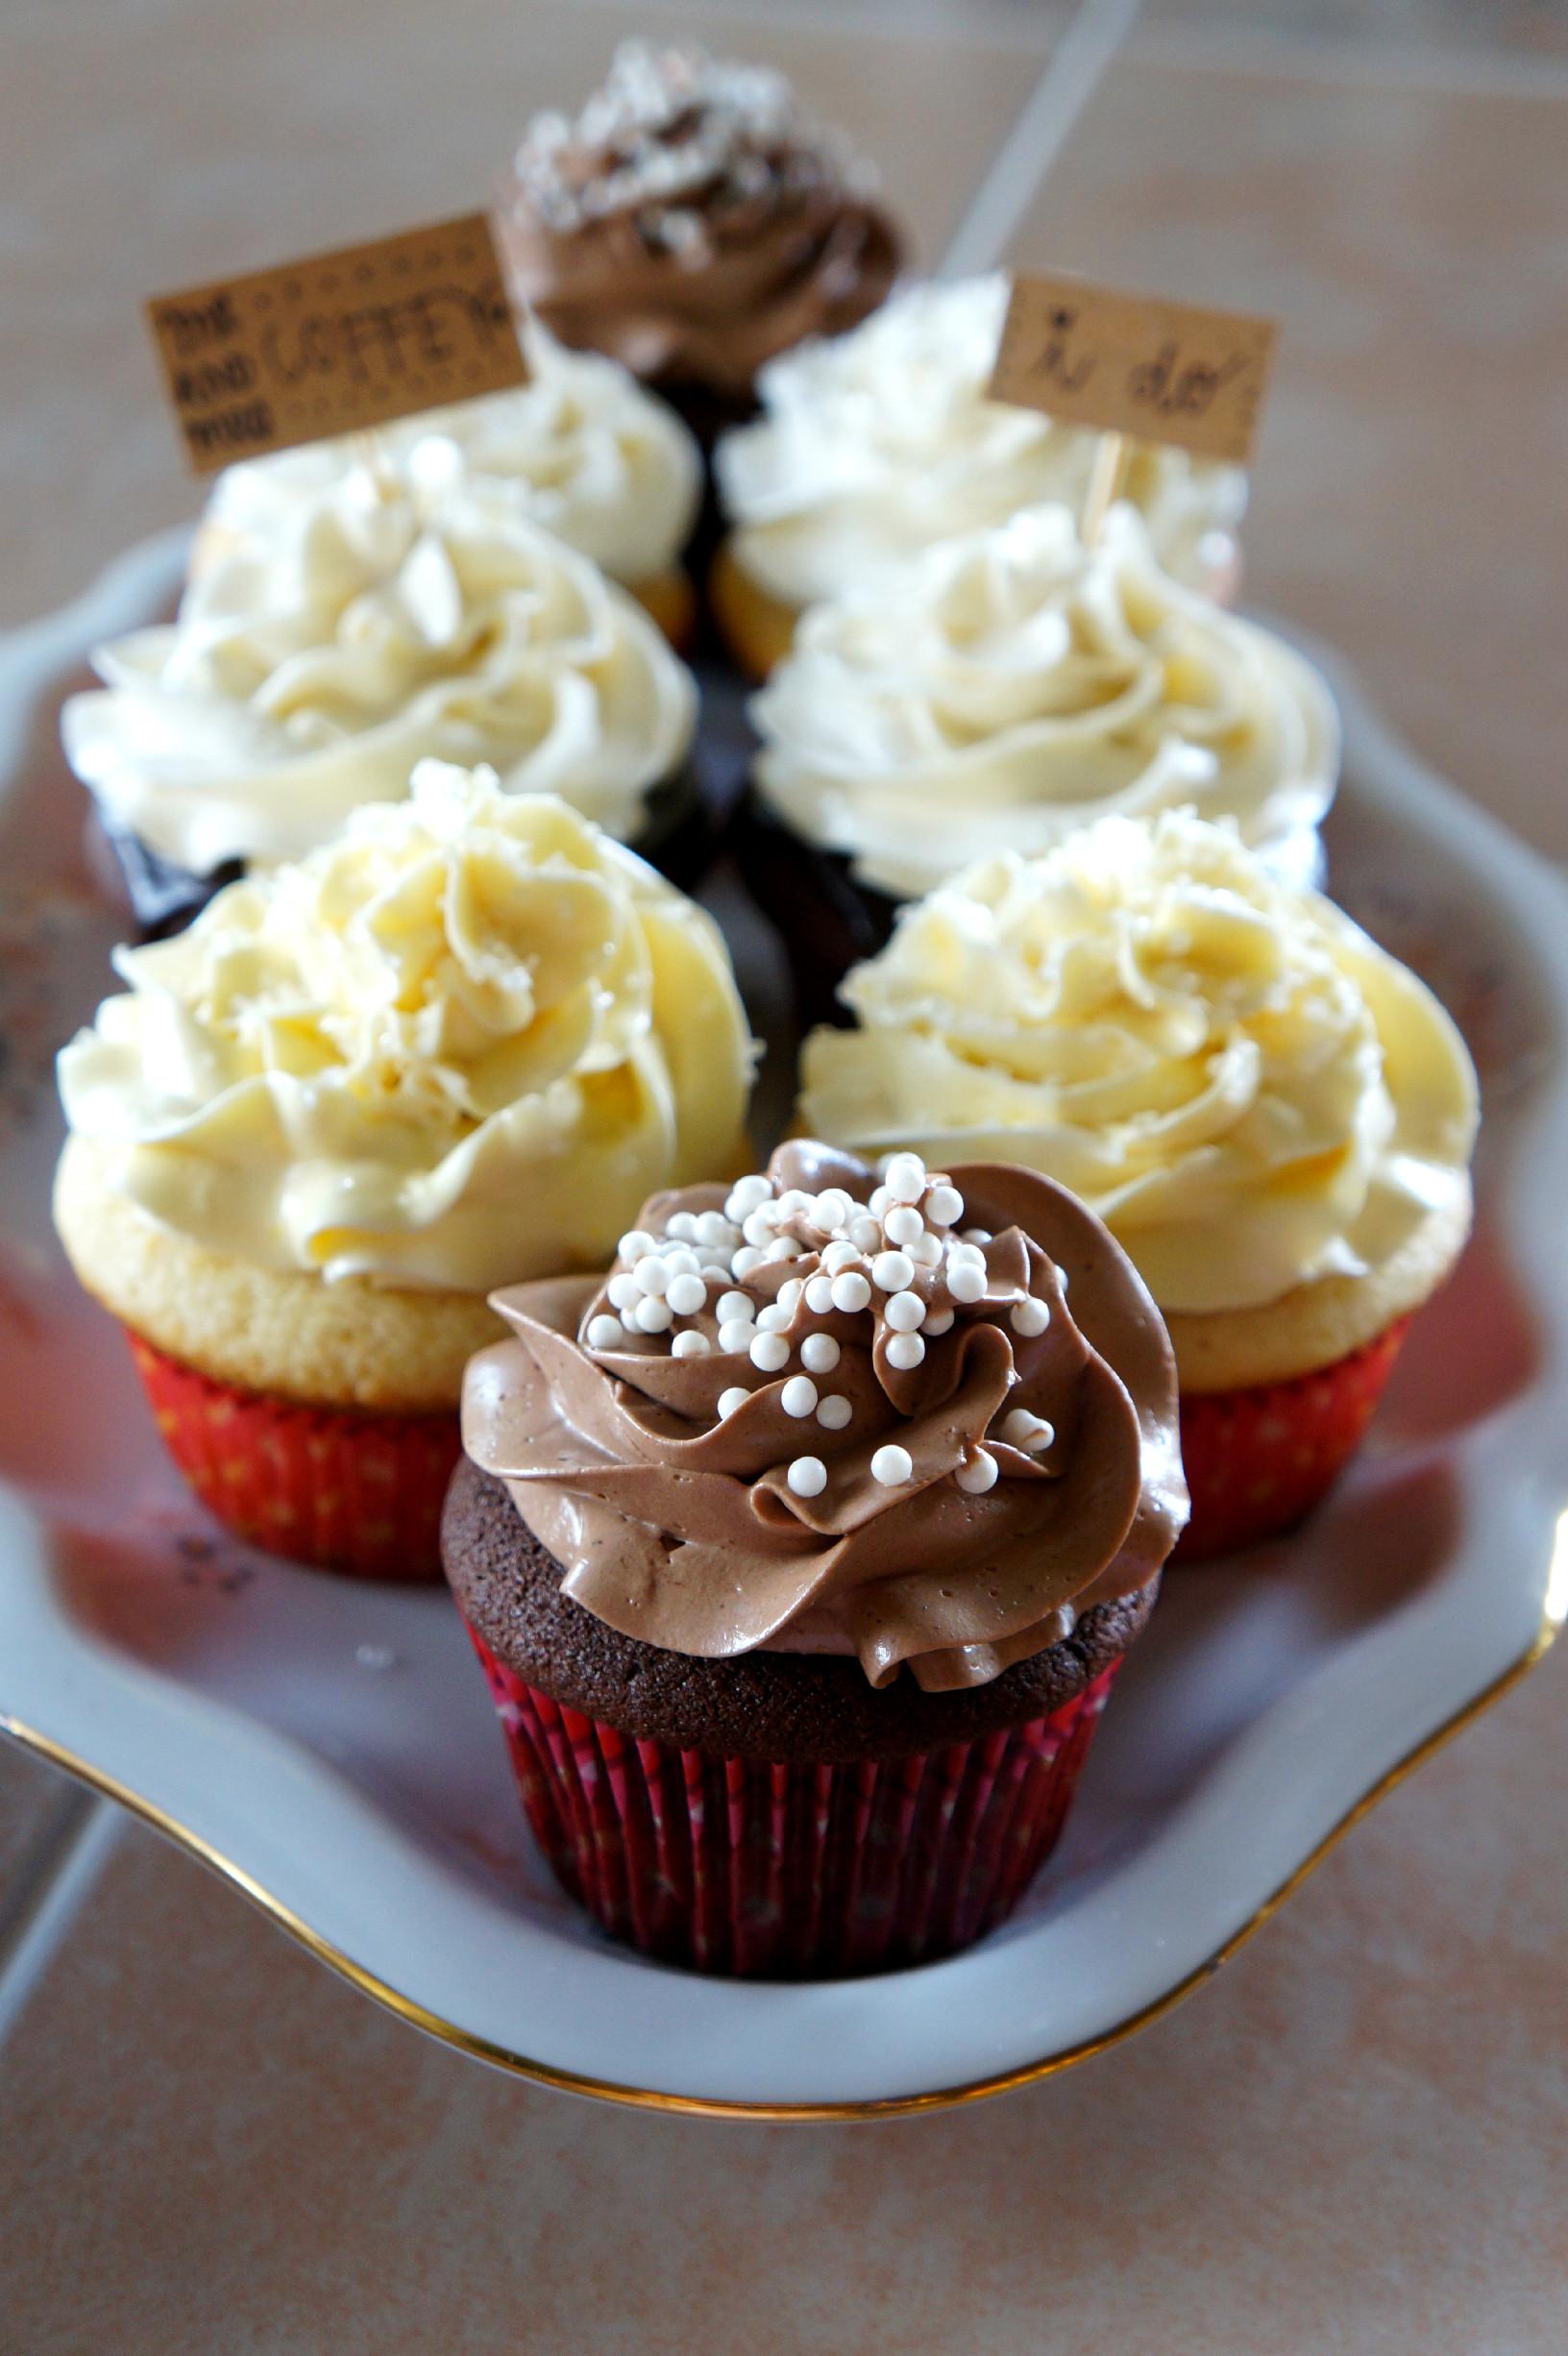 Wedding Cake Cupcakes Recipes  wedding cake tasting small batch recipes